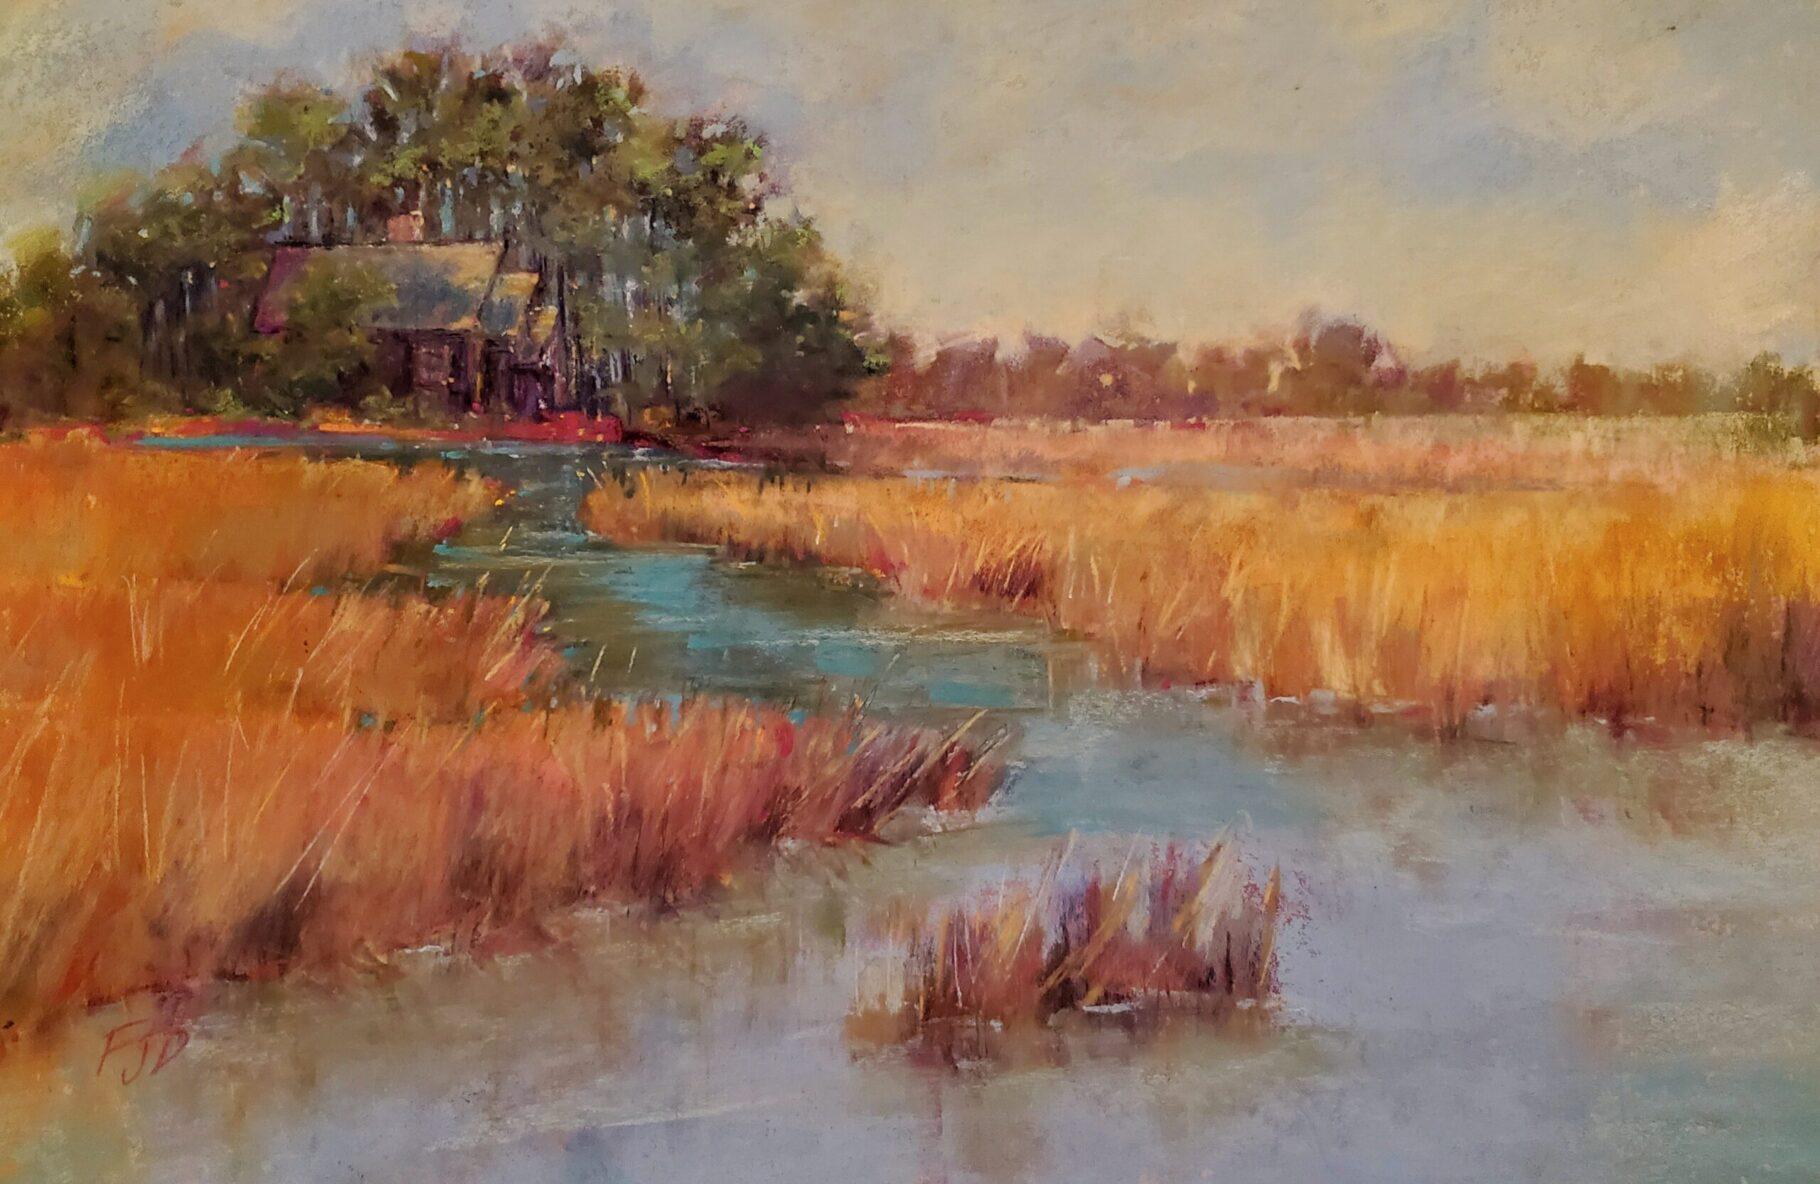 Fran Davies, On Rathall Creek